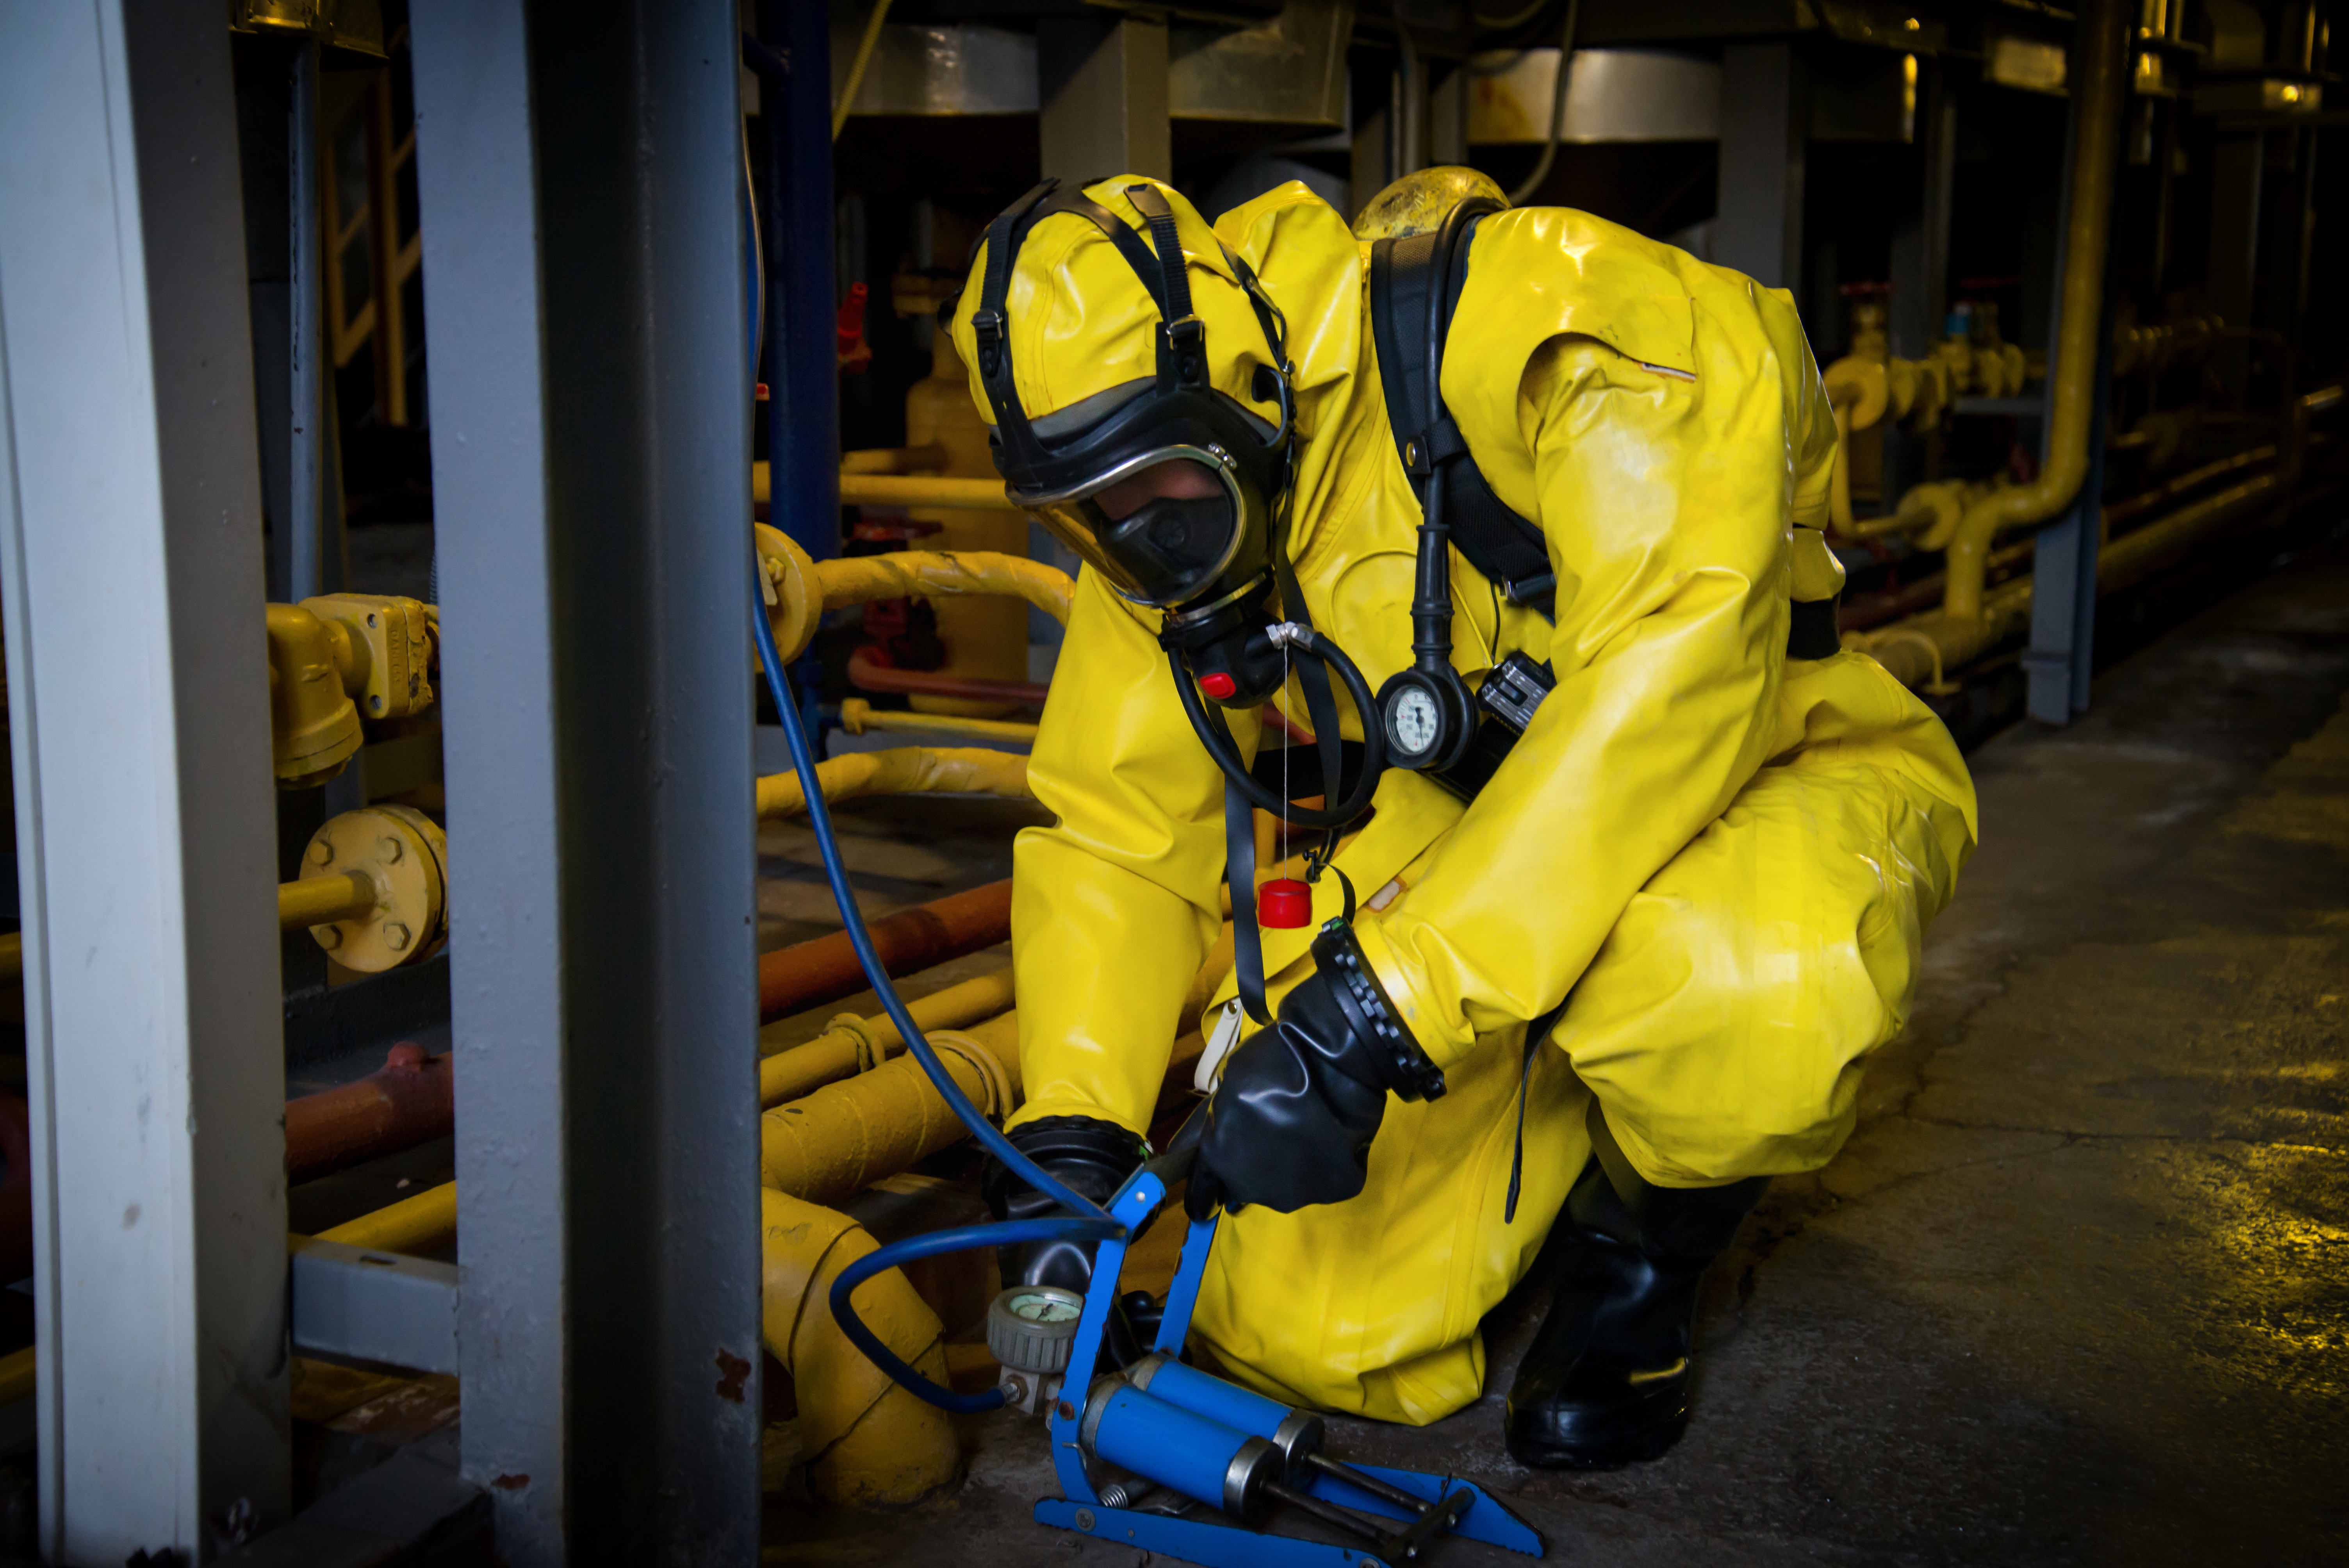 wide-area-instrumented-radiation-hazard-training